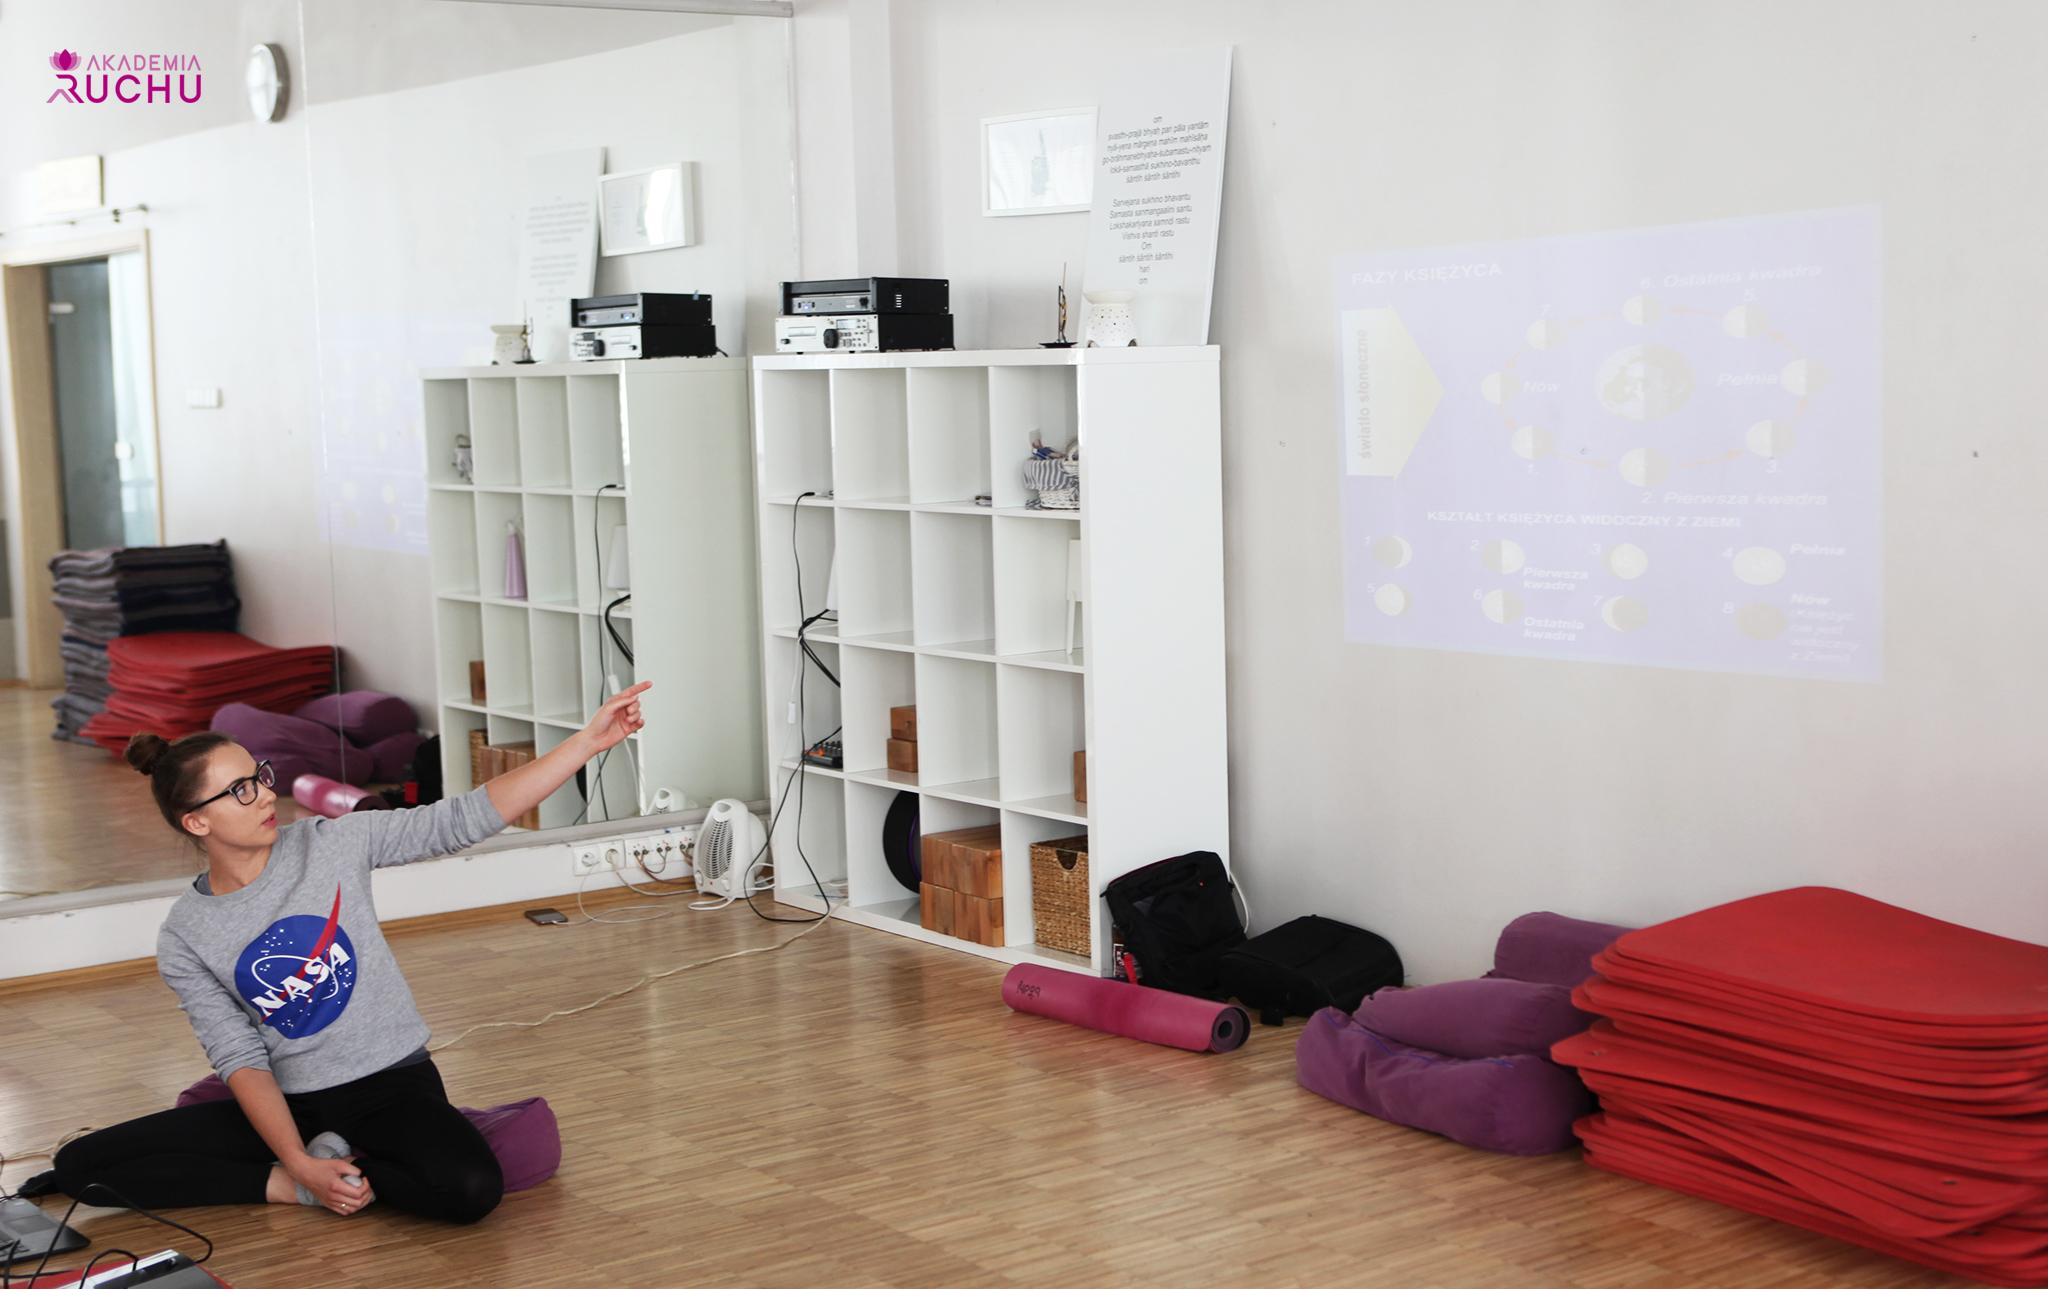 https://akademiaruchu.com.pl/wp-content/uploads/2019/11/3.jpg